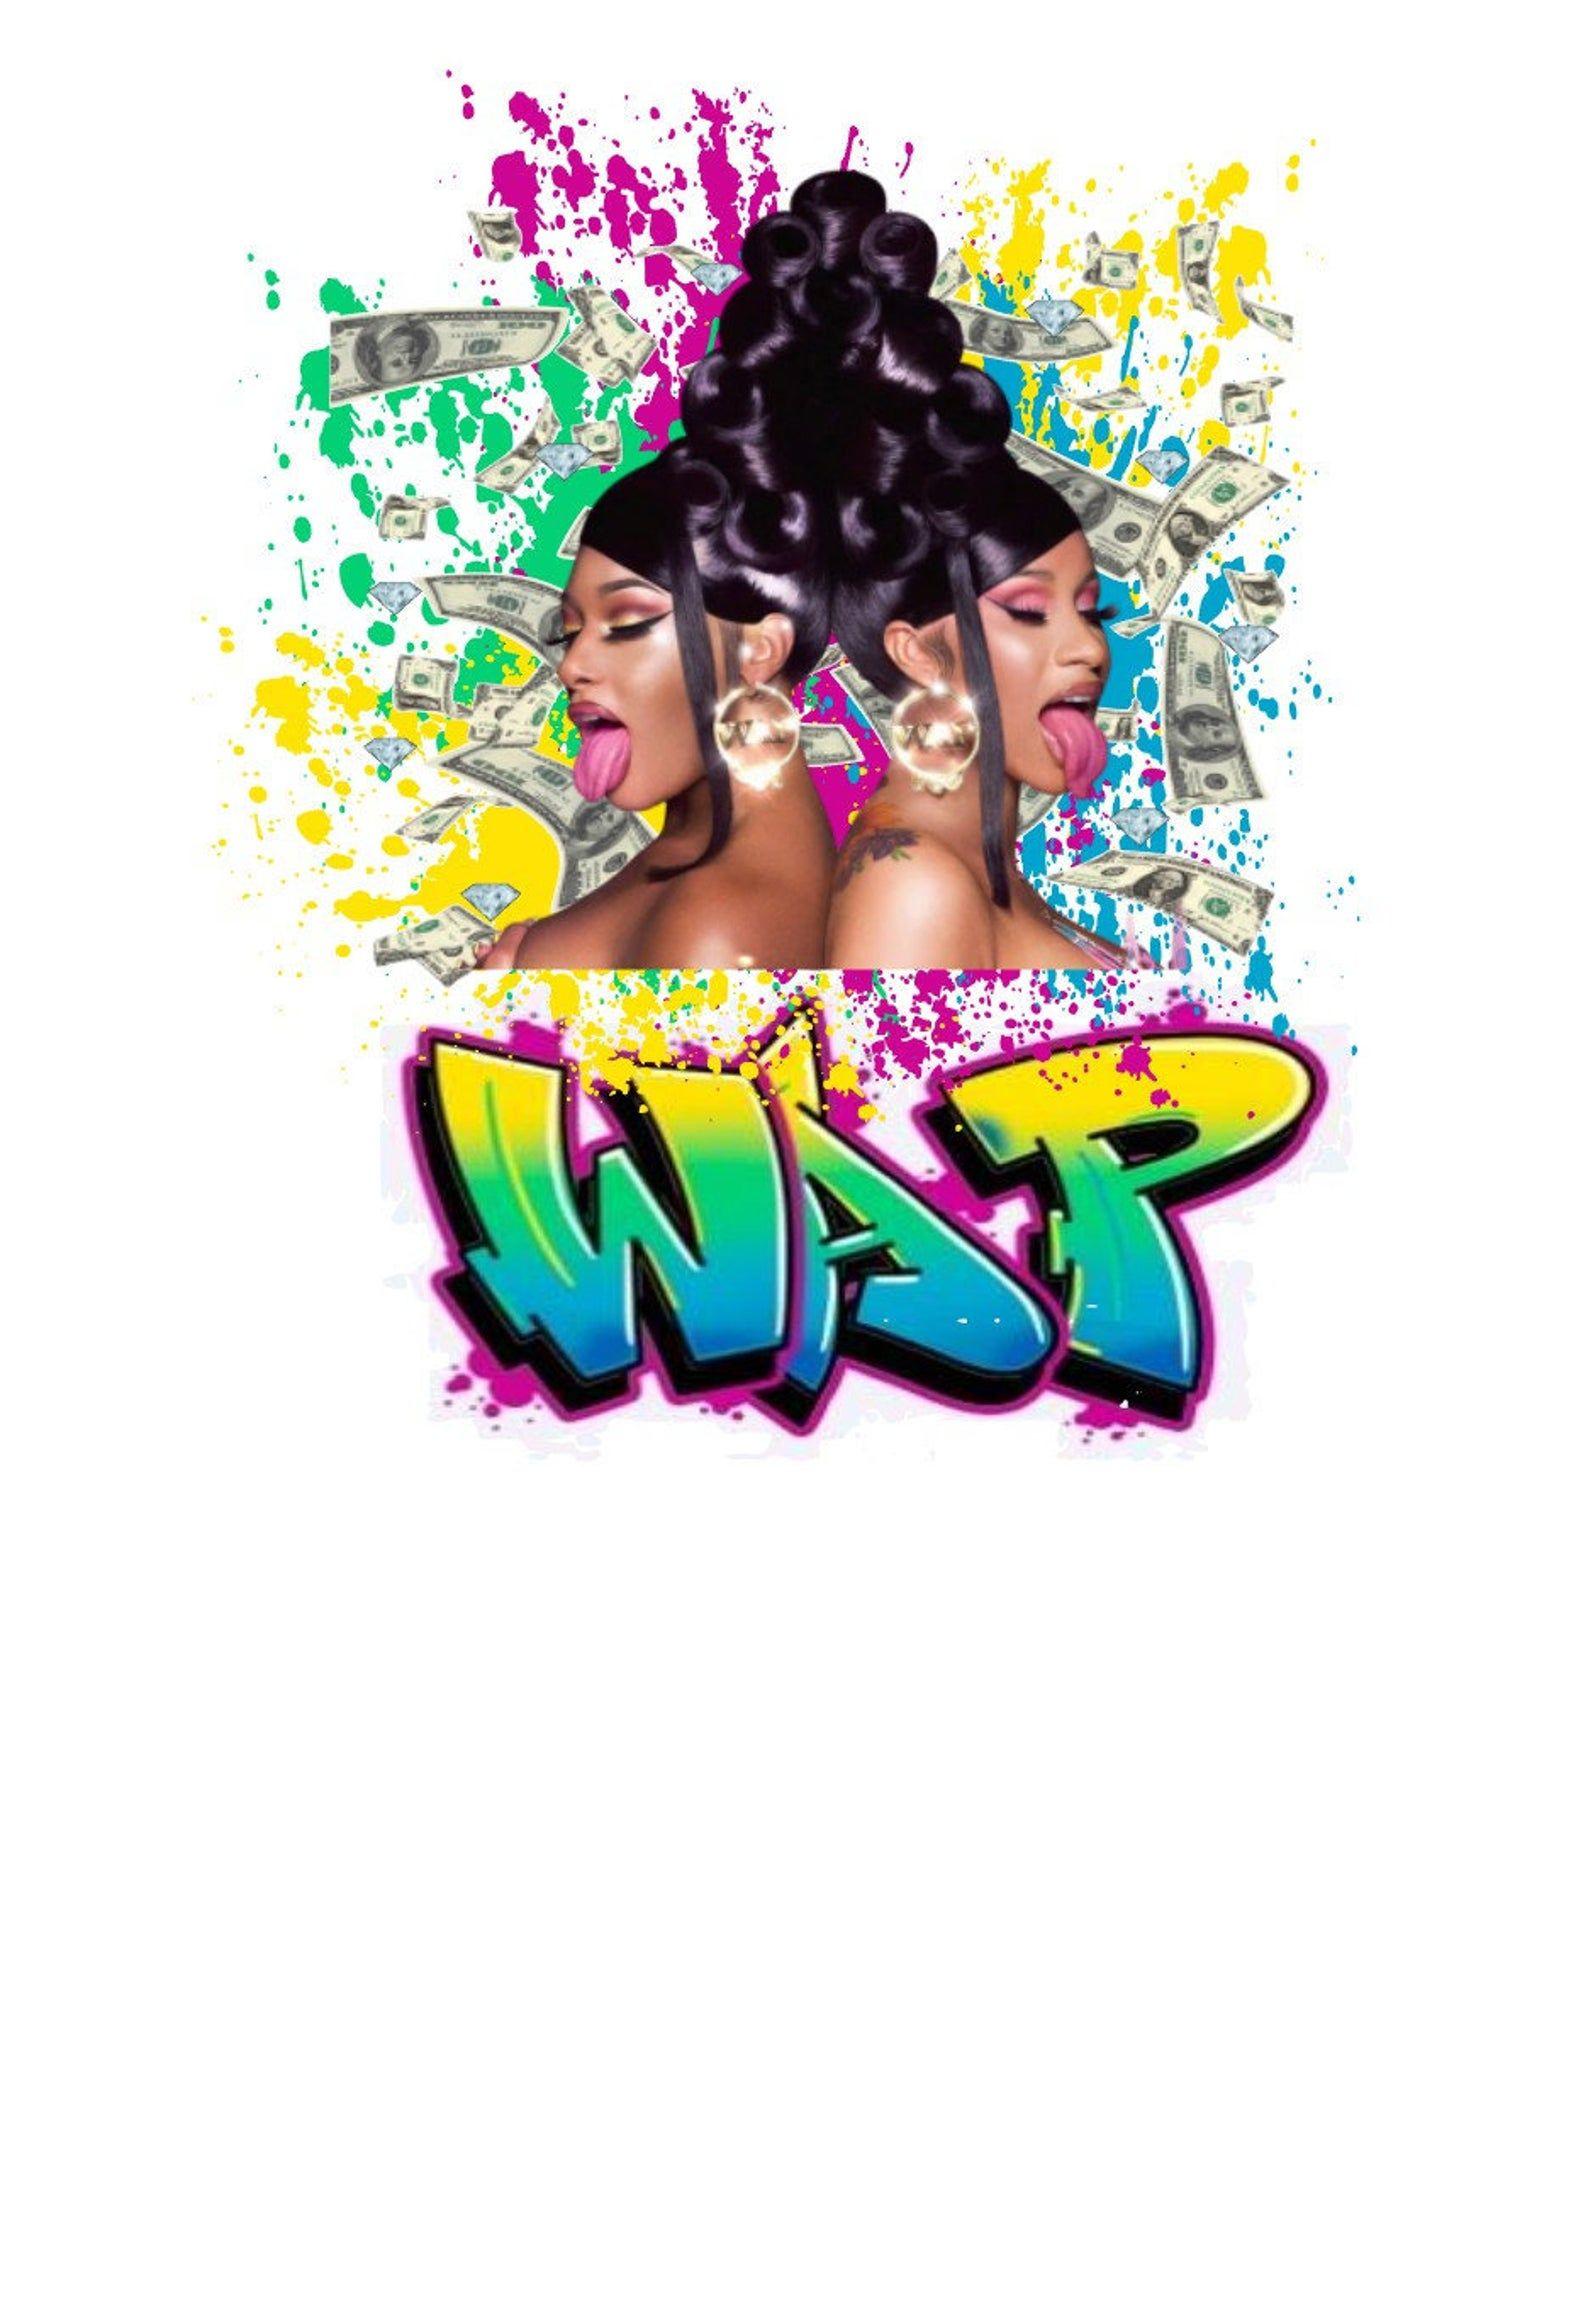 Wap Cardi B And Meg Png Jpeg Pdf Download Etsy In 2021 Cardi B Pics Cardi B Photos Cardi B